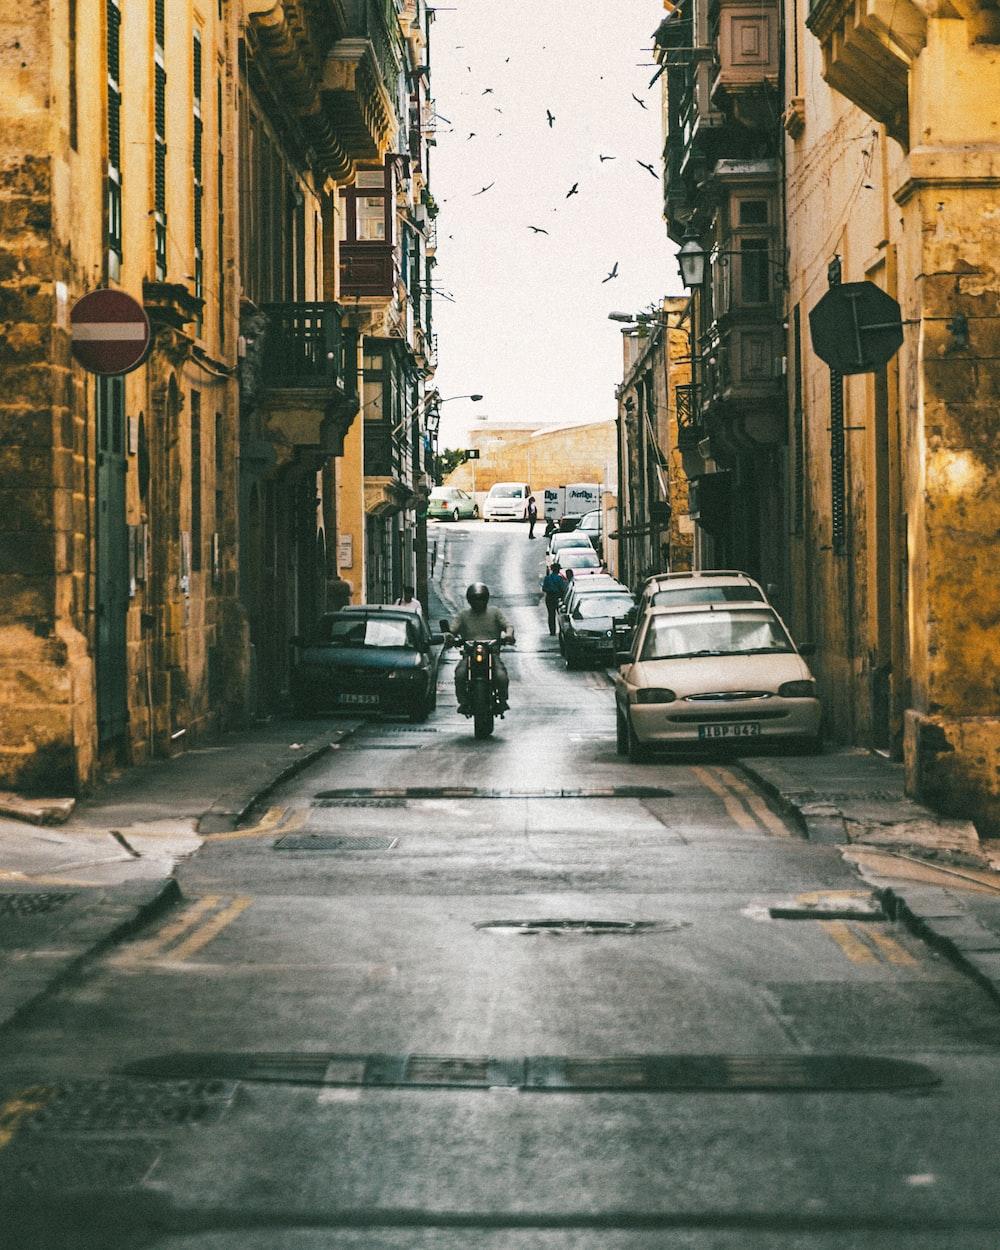 man riding motorcycle passing through buildings